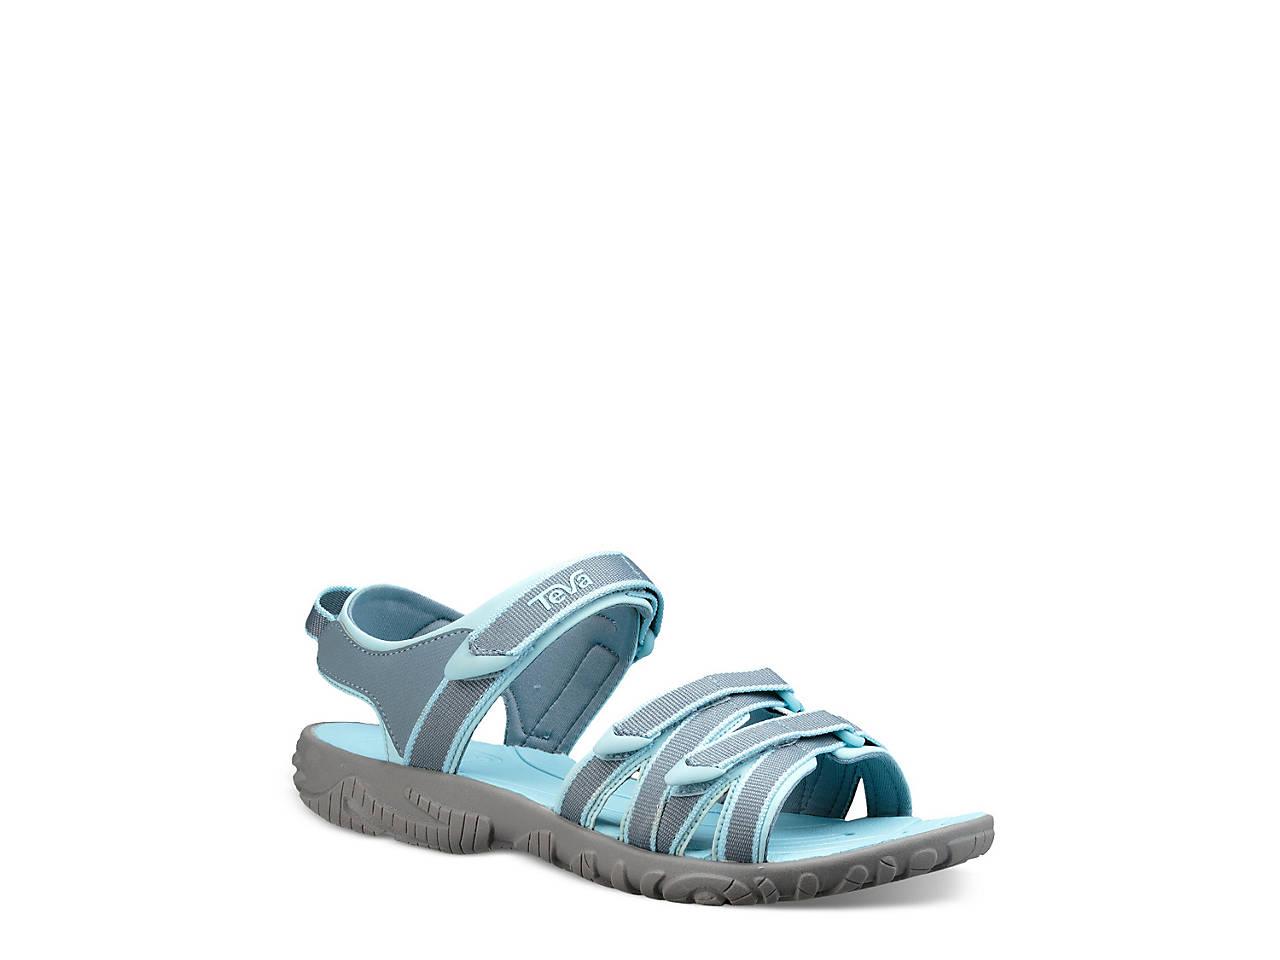 3d0bb5f45d8d Teva Tirra Youth Sandal Kids Shoes